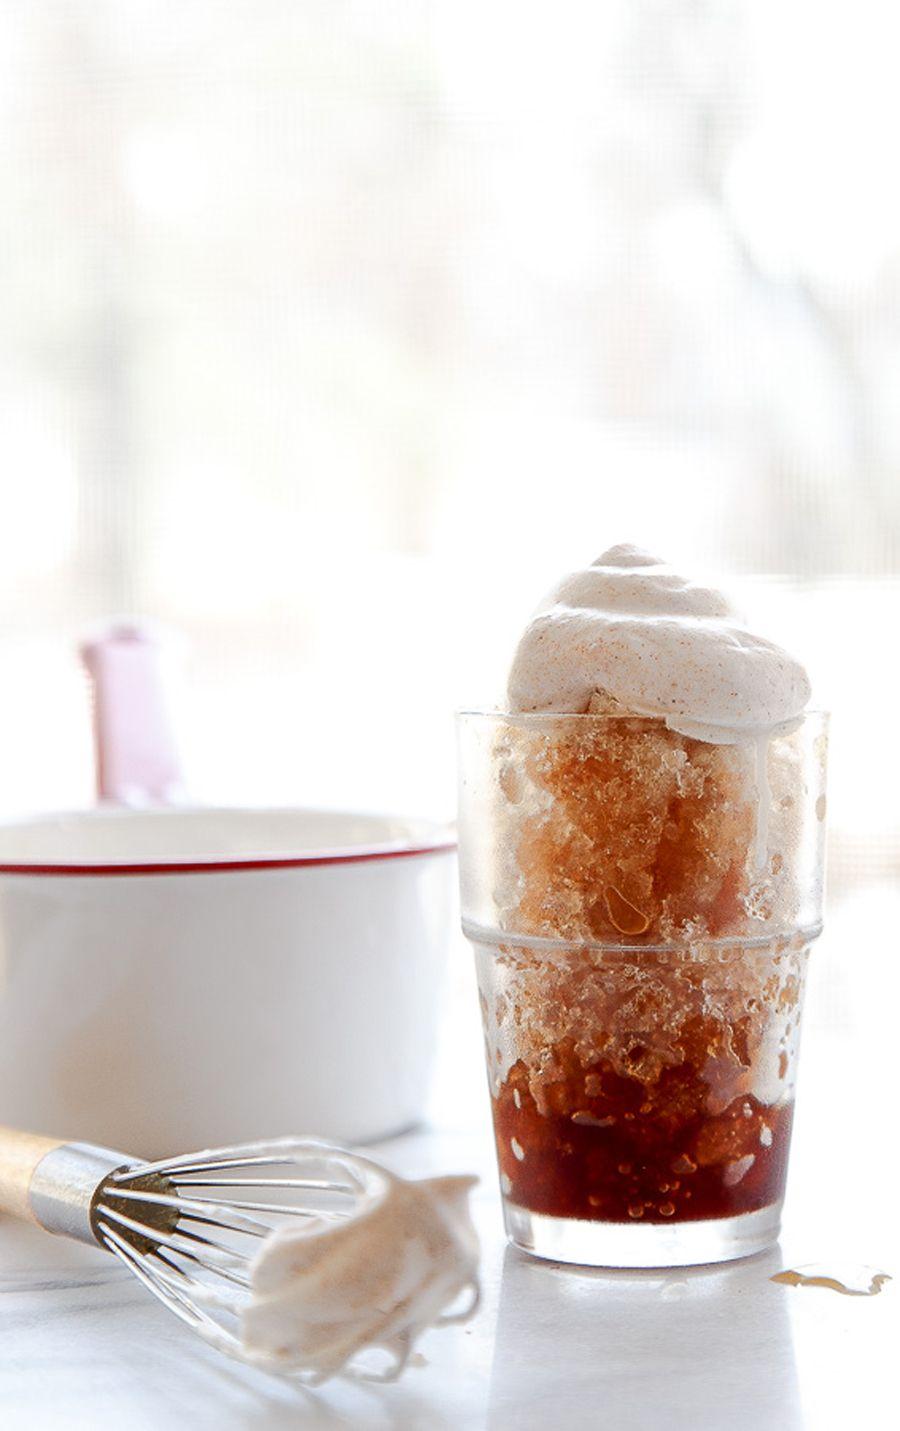 Espresso granita + chai whip: http://www.stylemepretty.com/living/2015/07/16/summers-sweetest-cool-coffee-treats/